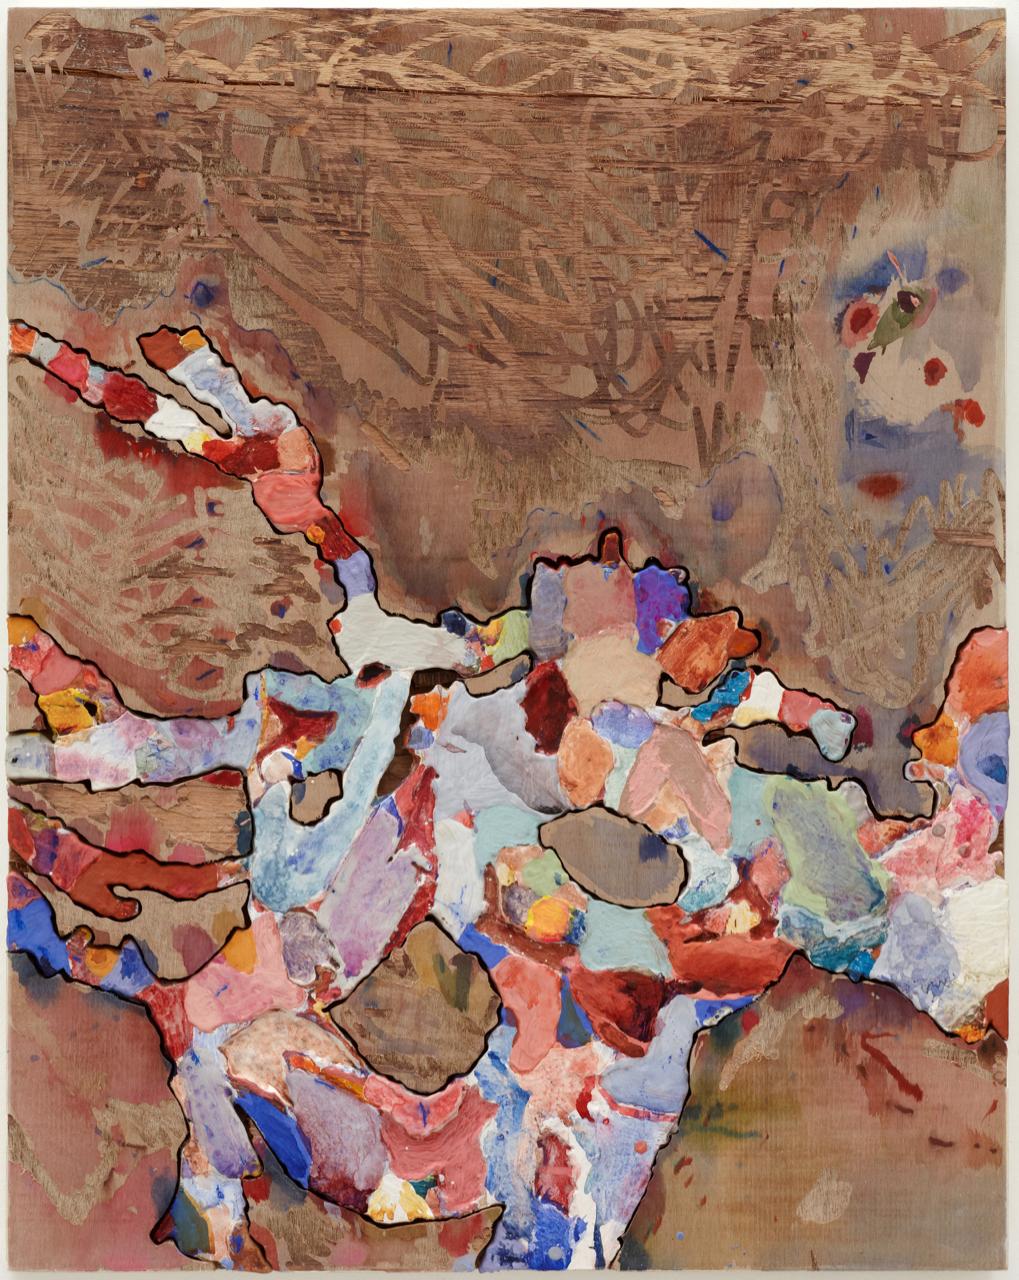 Jigsaw painting No 1